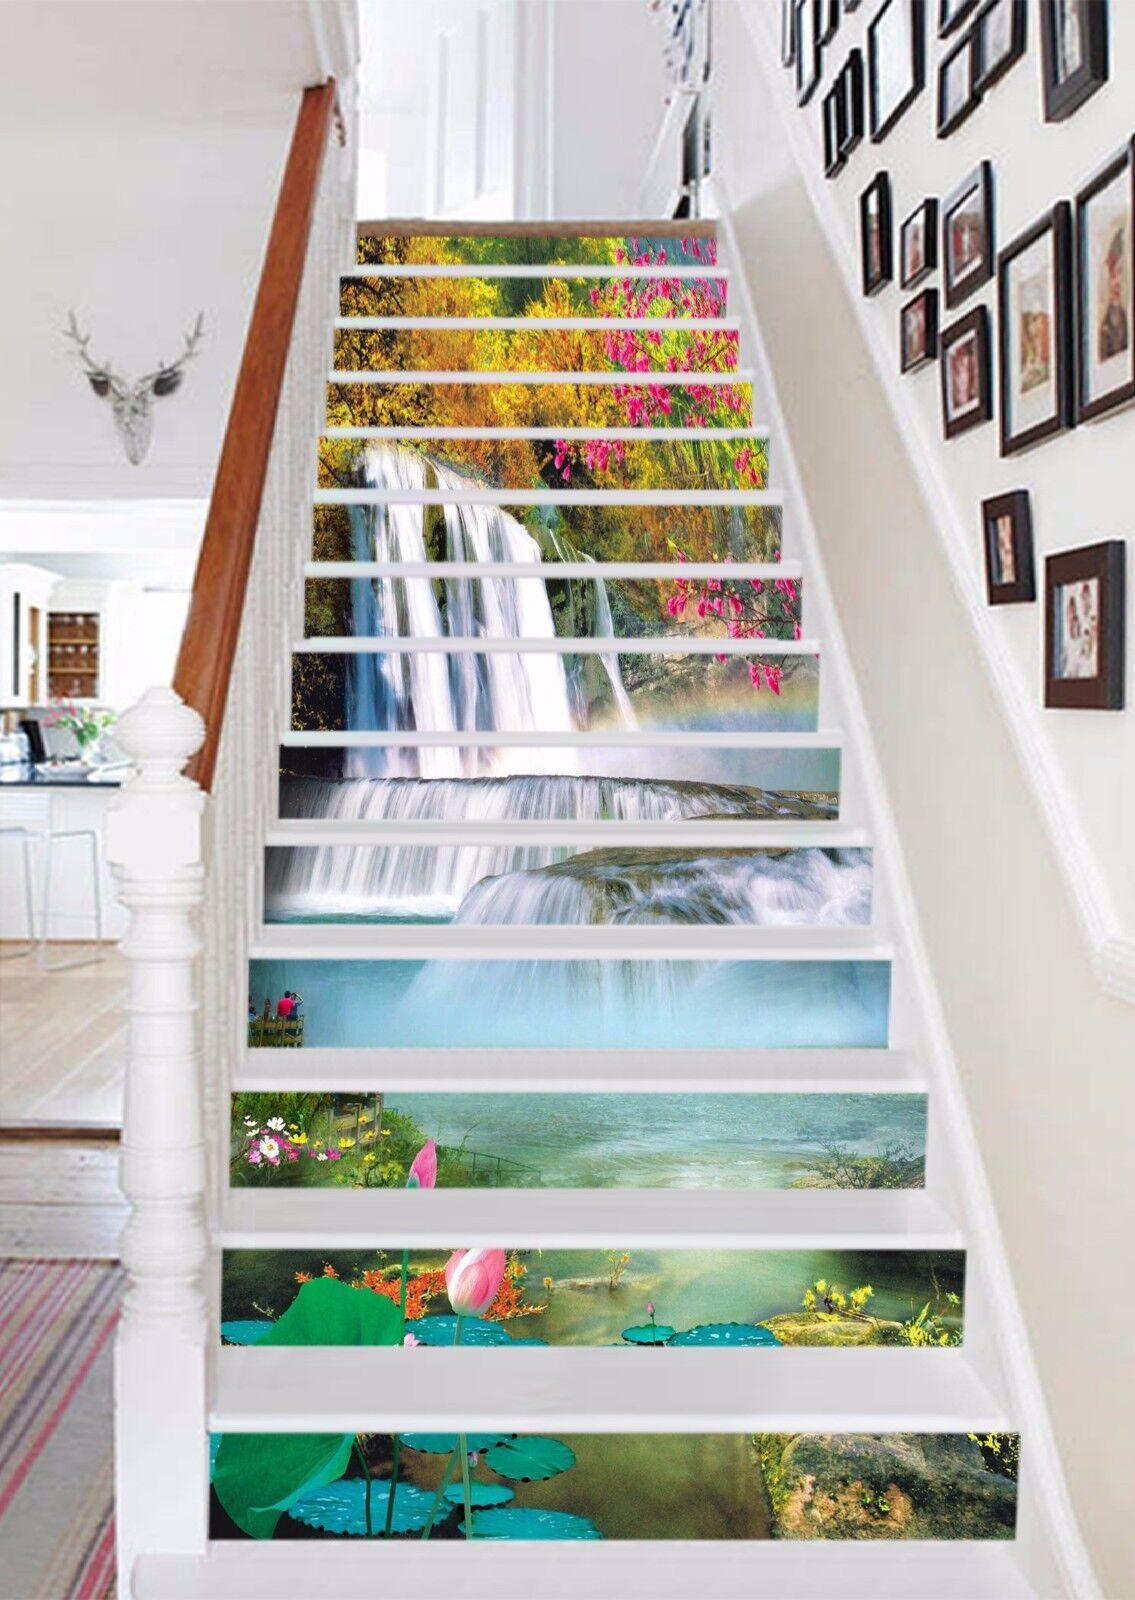 3D Falls View 153 Stair Risers Decoration Photo Mural Vinyl Decal Wallpaper AU